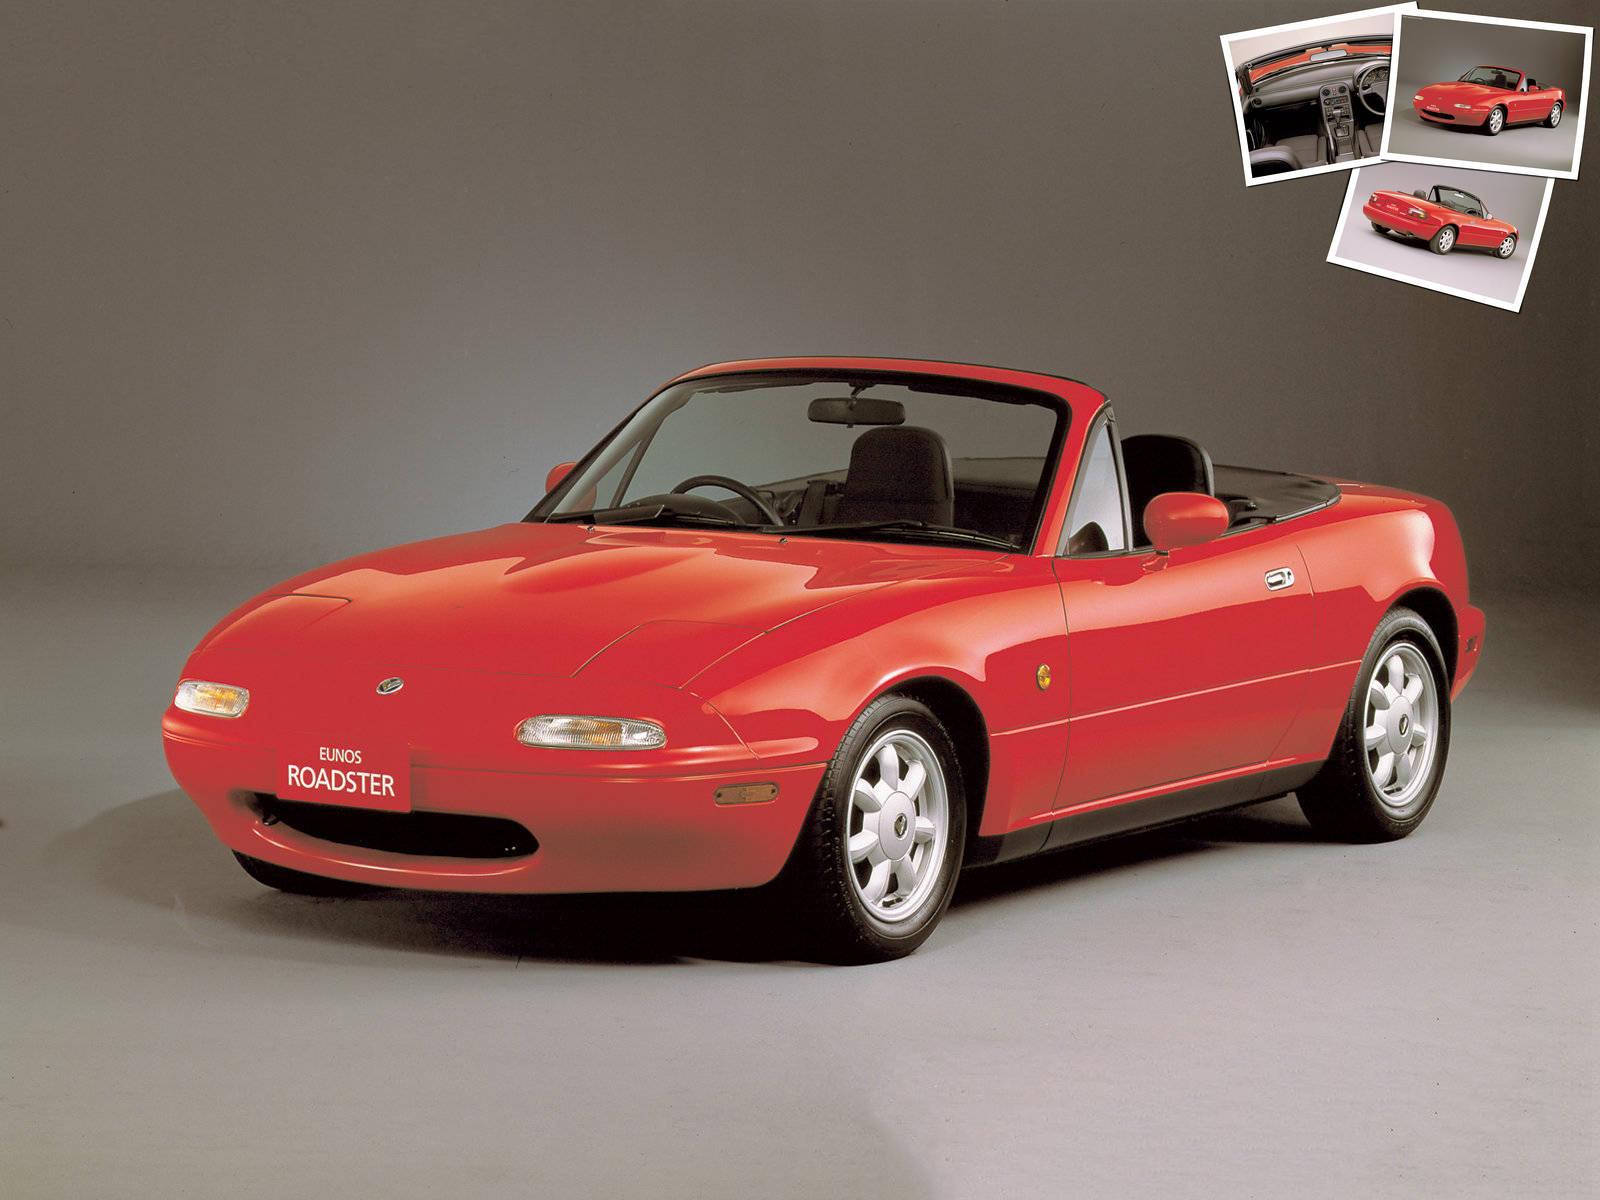 Mazda MX 5_Miata_Roadster 1989 Wallpaper